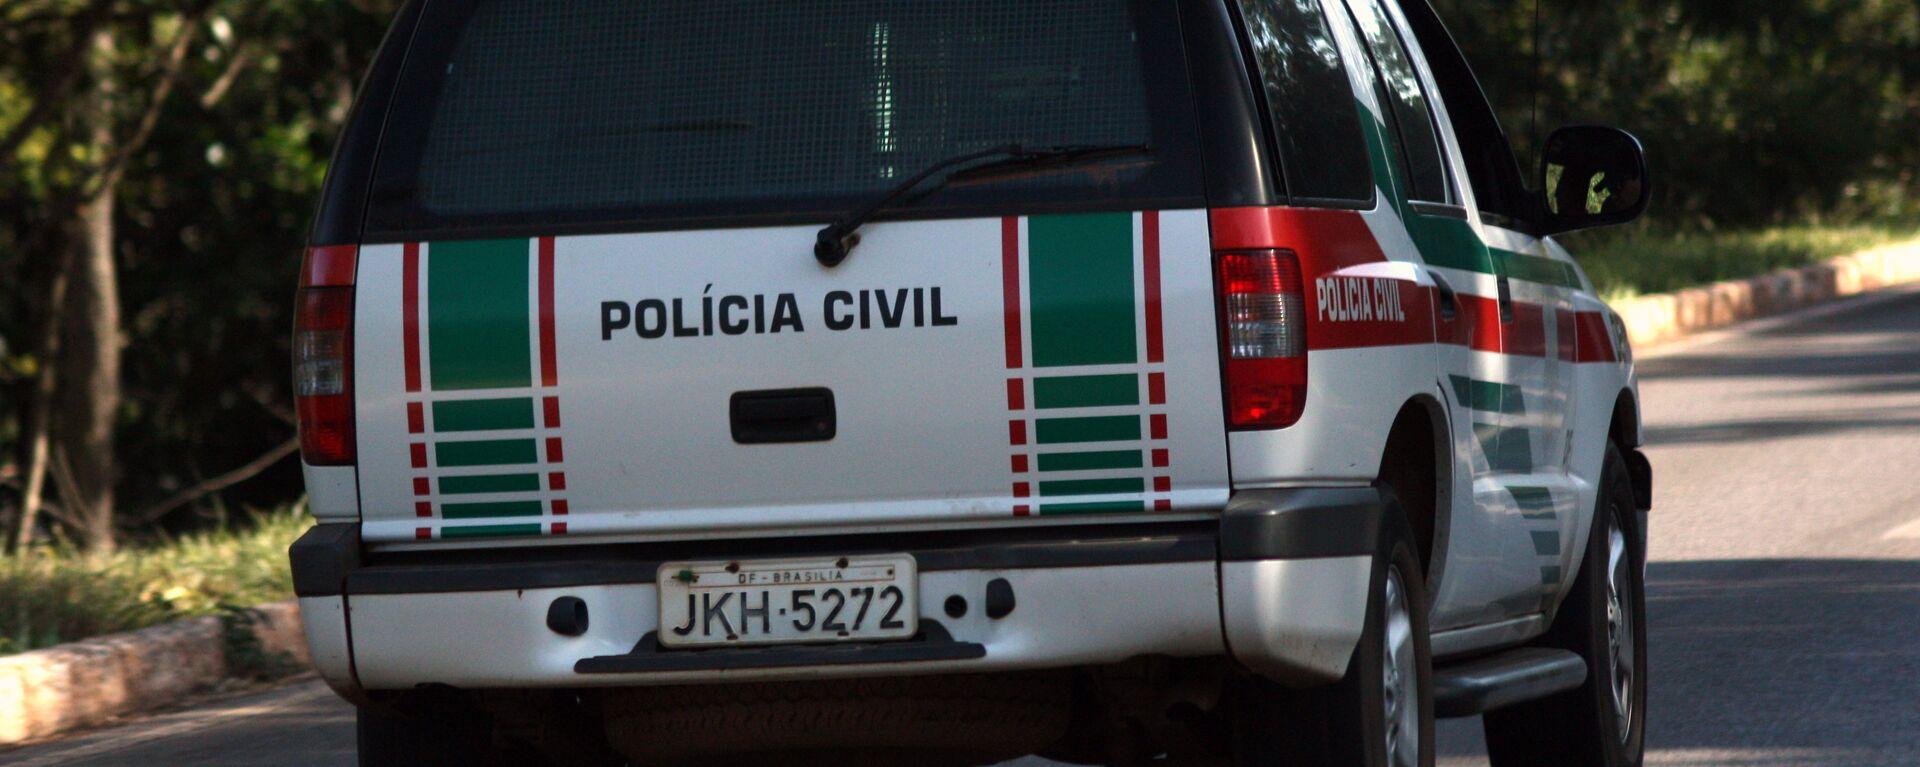 Policía Civil de Brasil - Sputnik Mundo, 1920, 17.05.2021